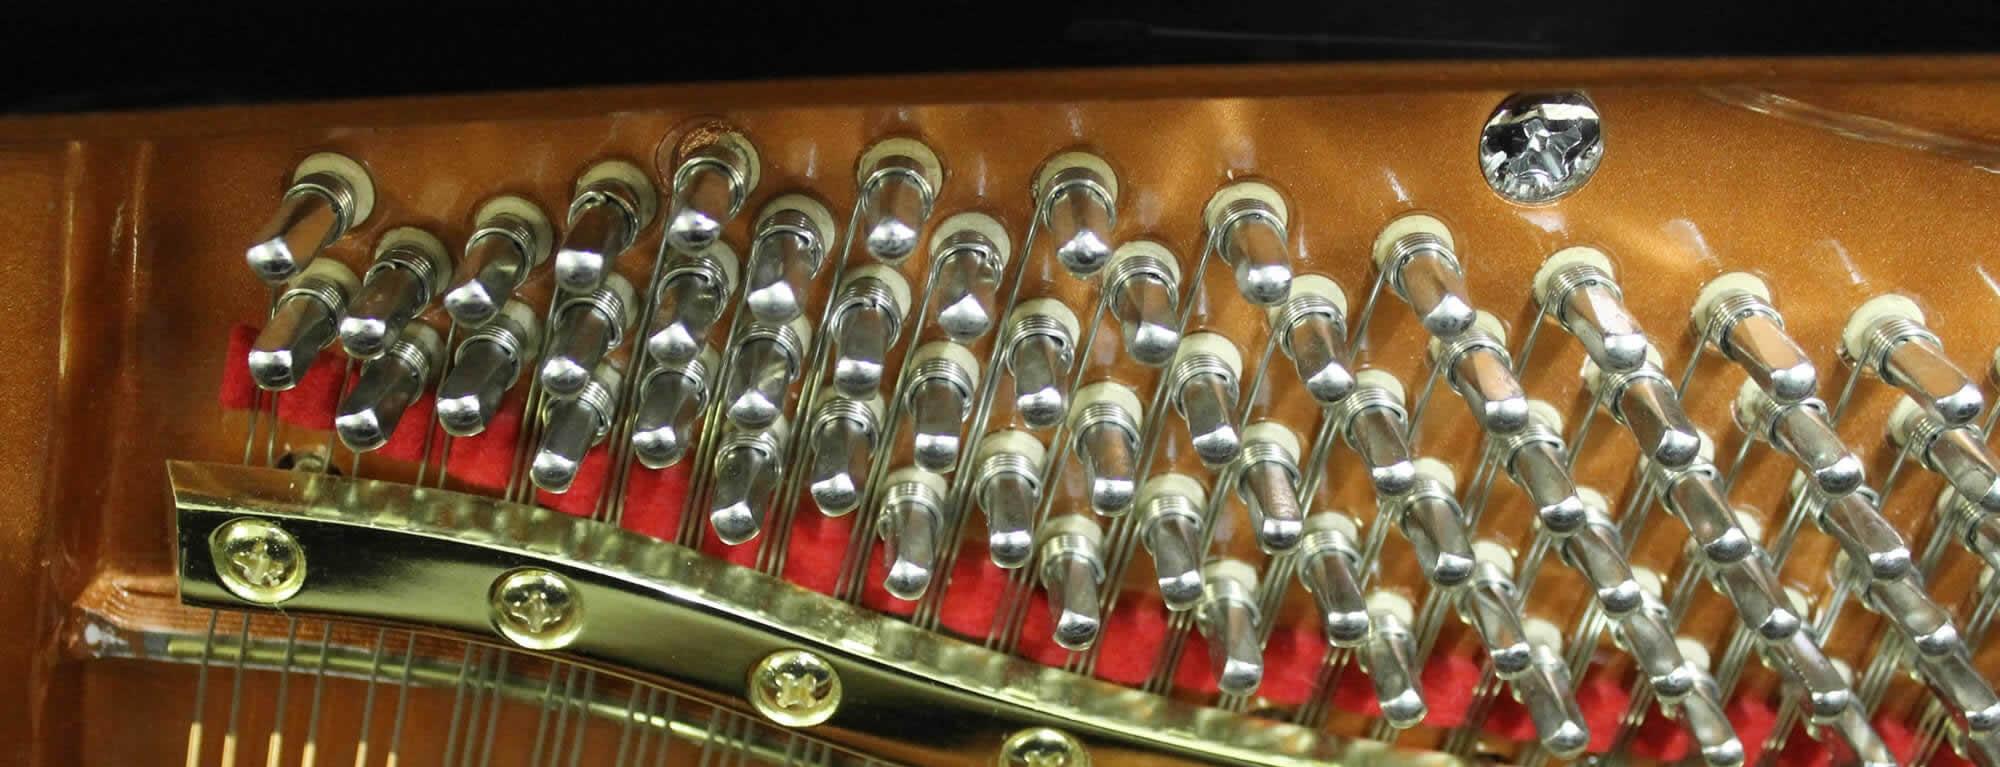 sheffield_pianos_gallery_image1.jpg